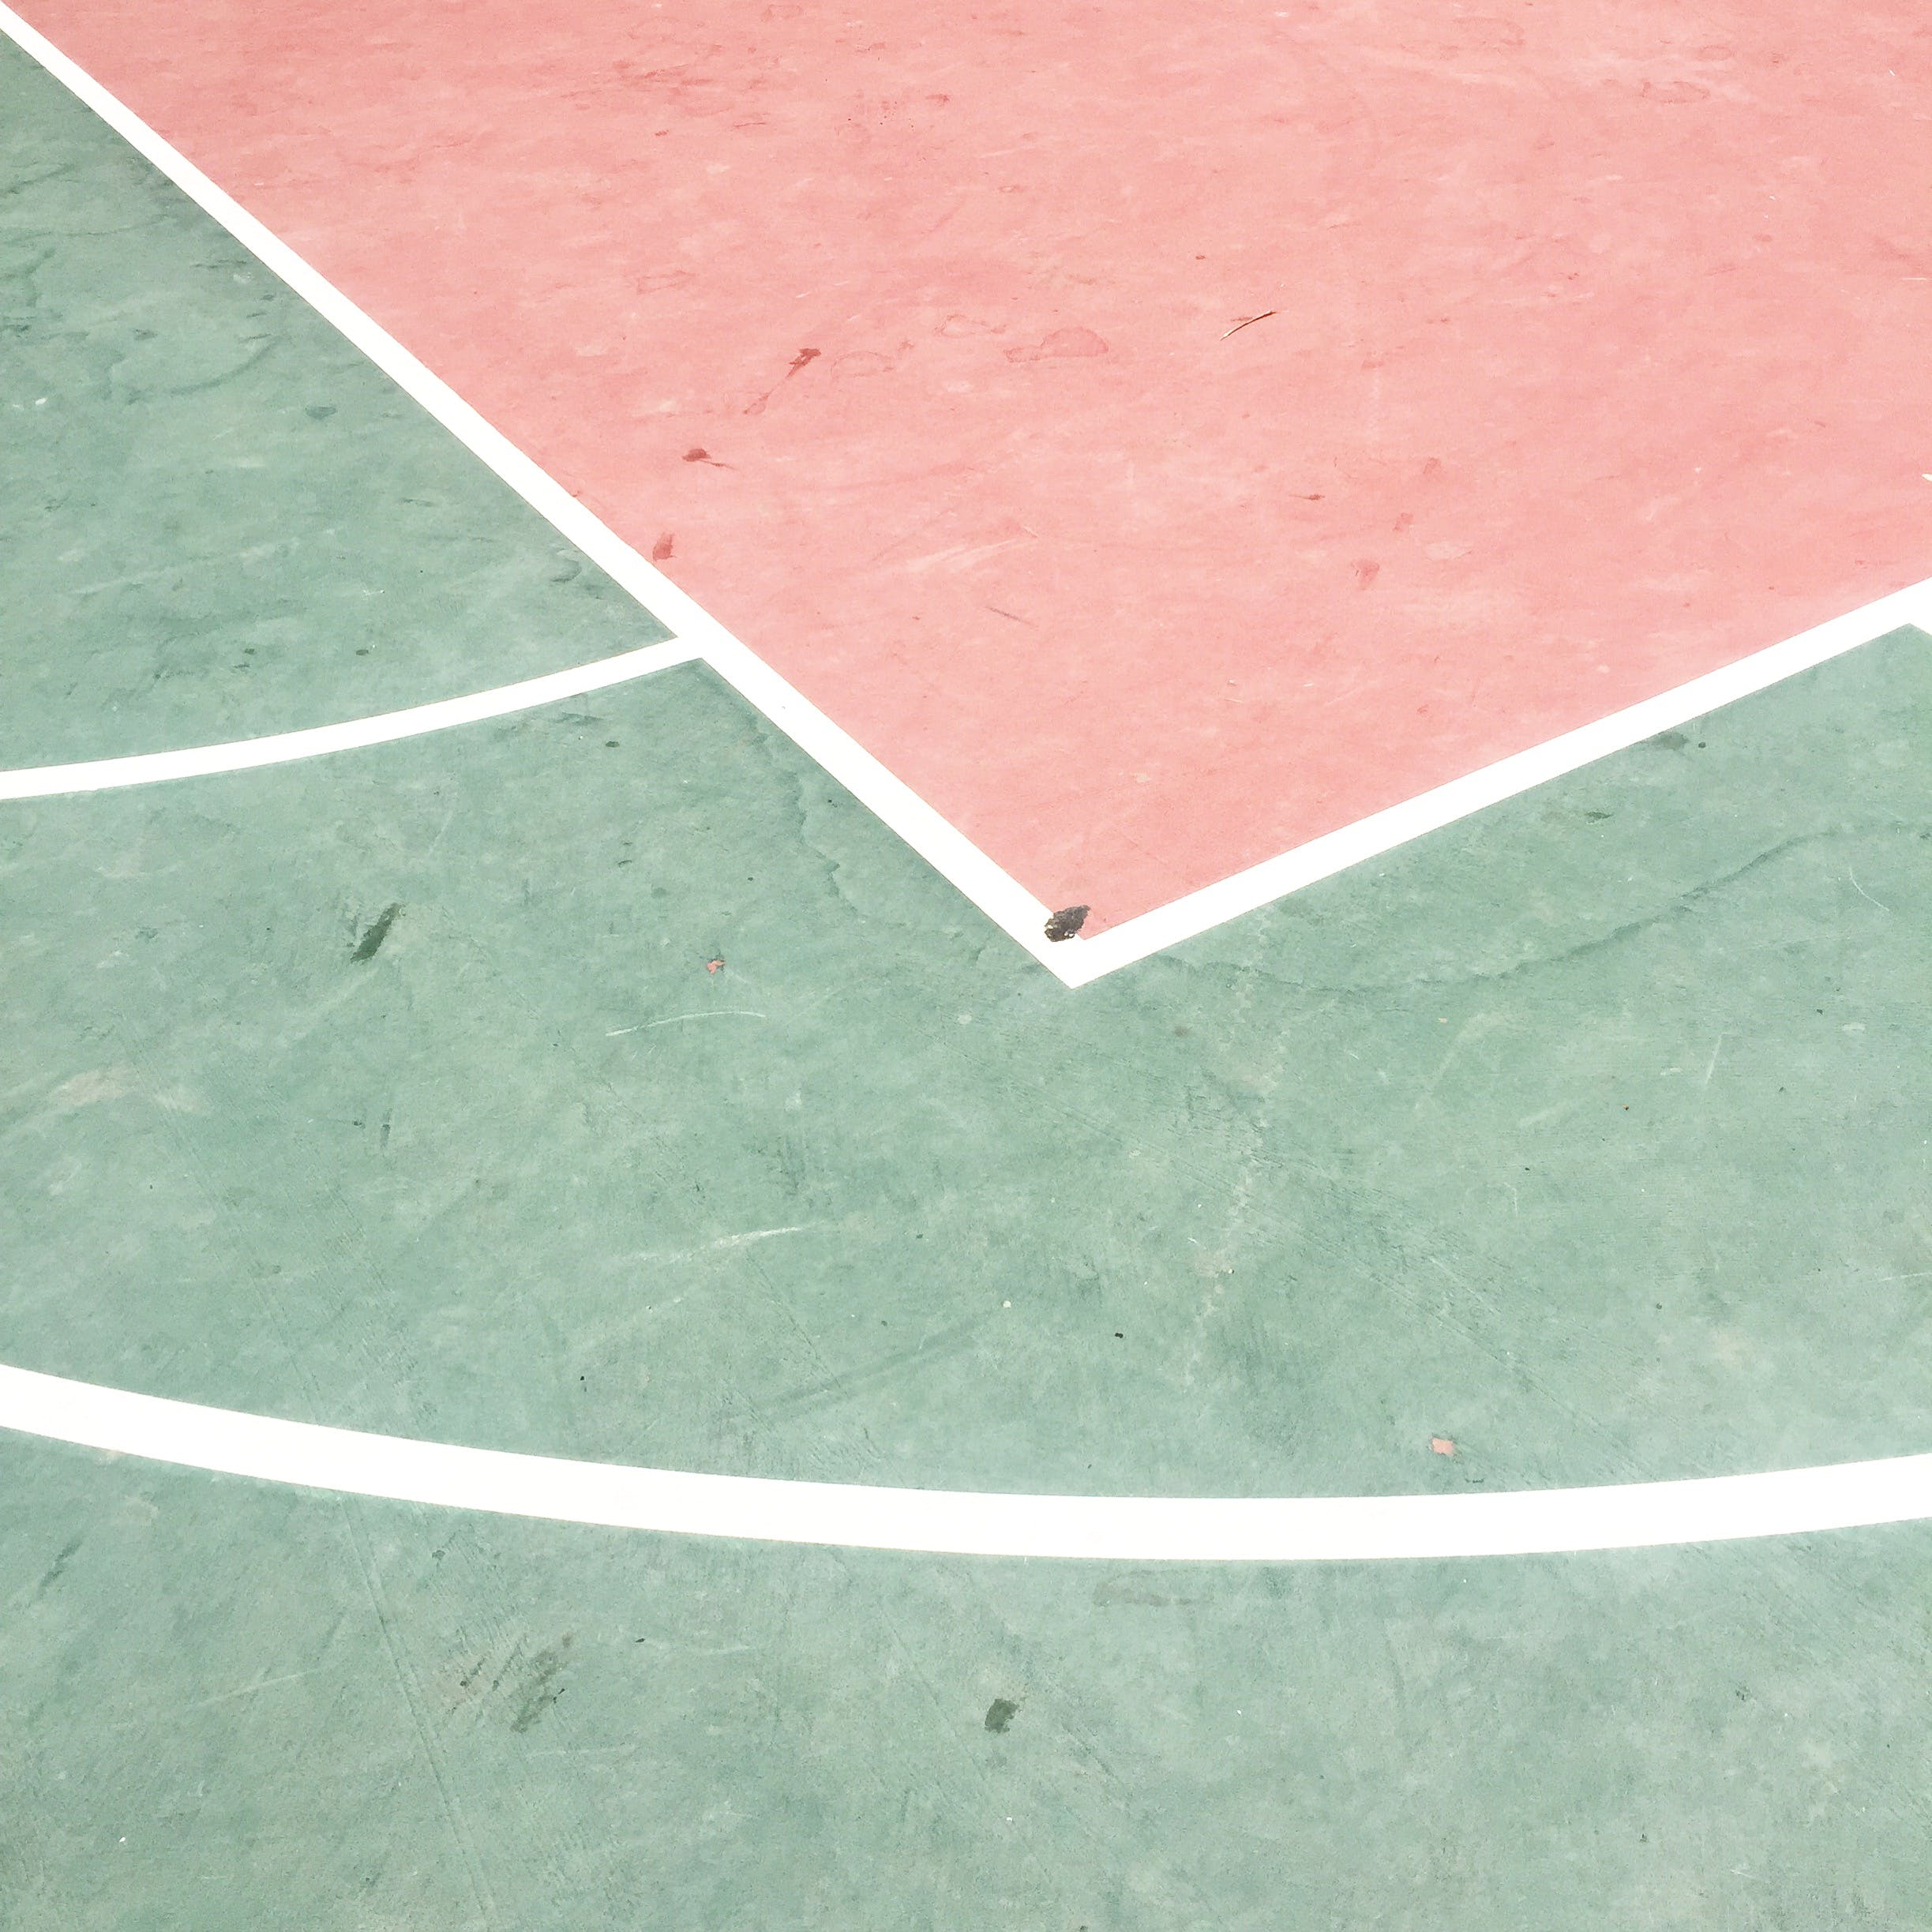 Free stock photo of ground, tennis, court, tennis ball